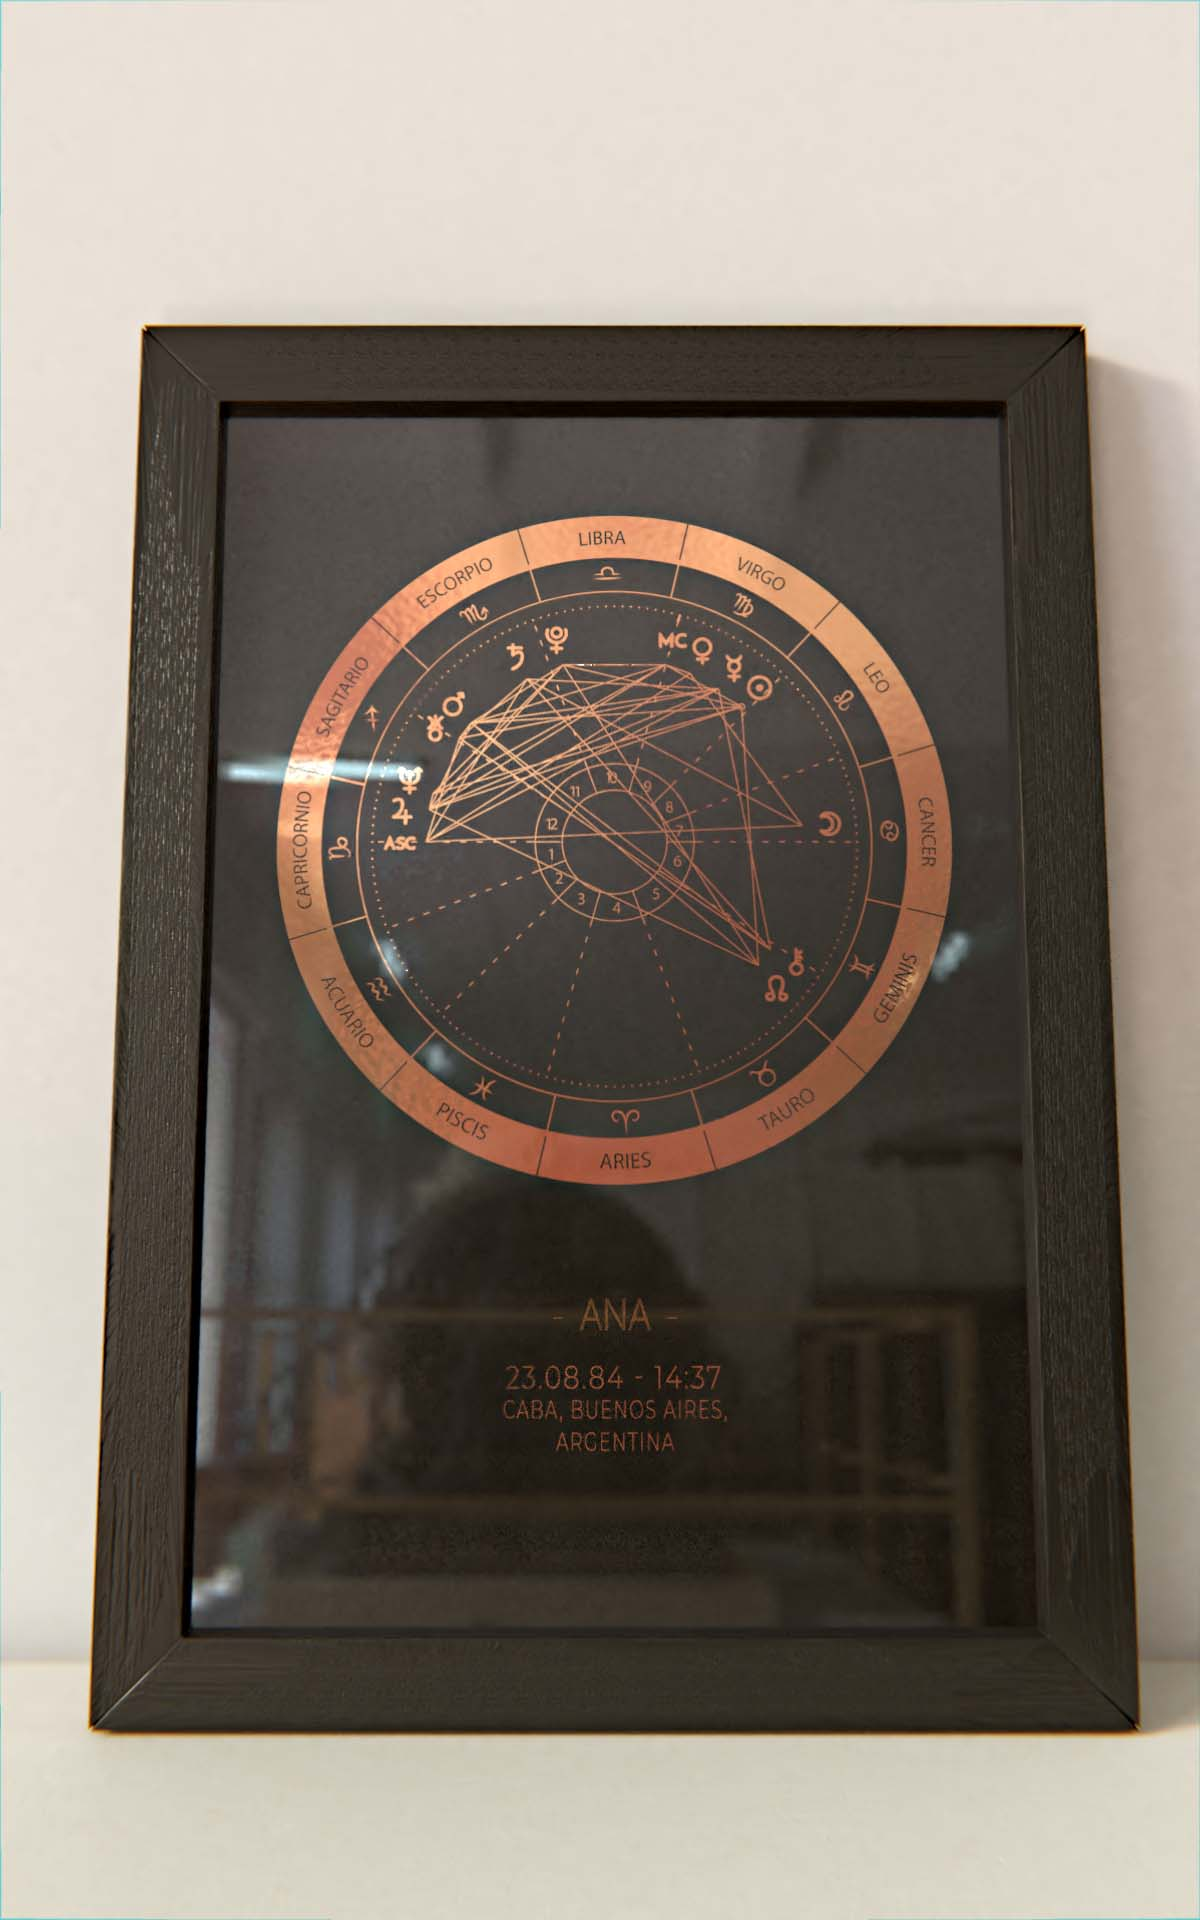 Arte Astral - Carta Astral Simple Cobre marco negro Hoja Negra